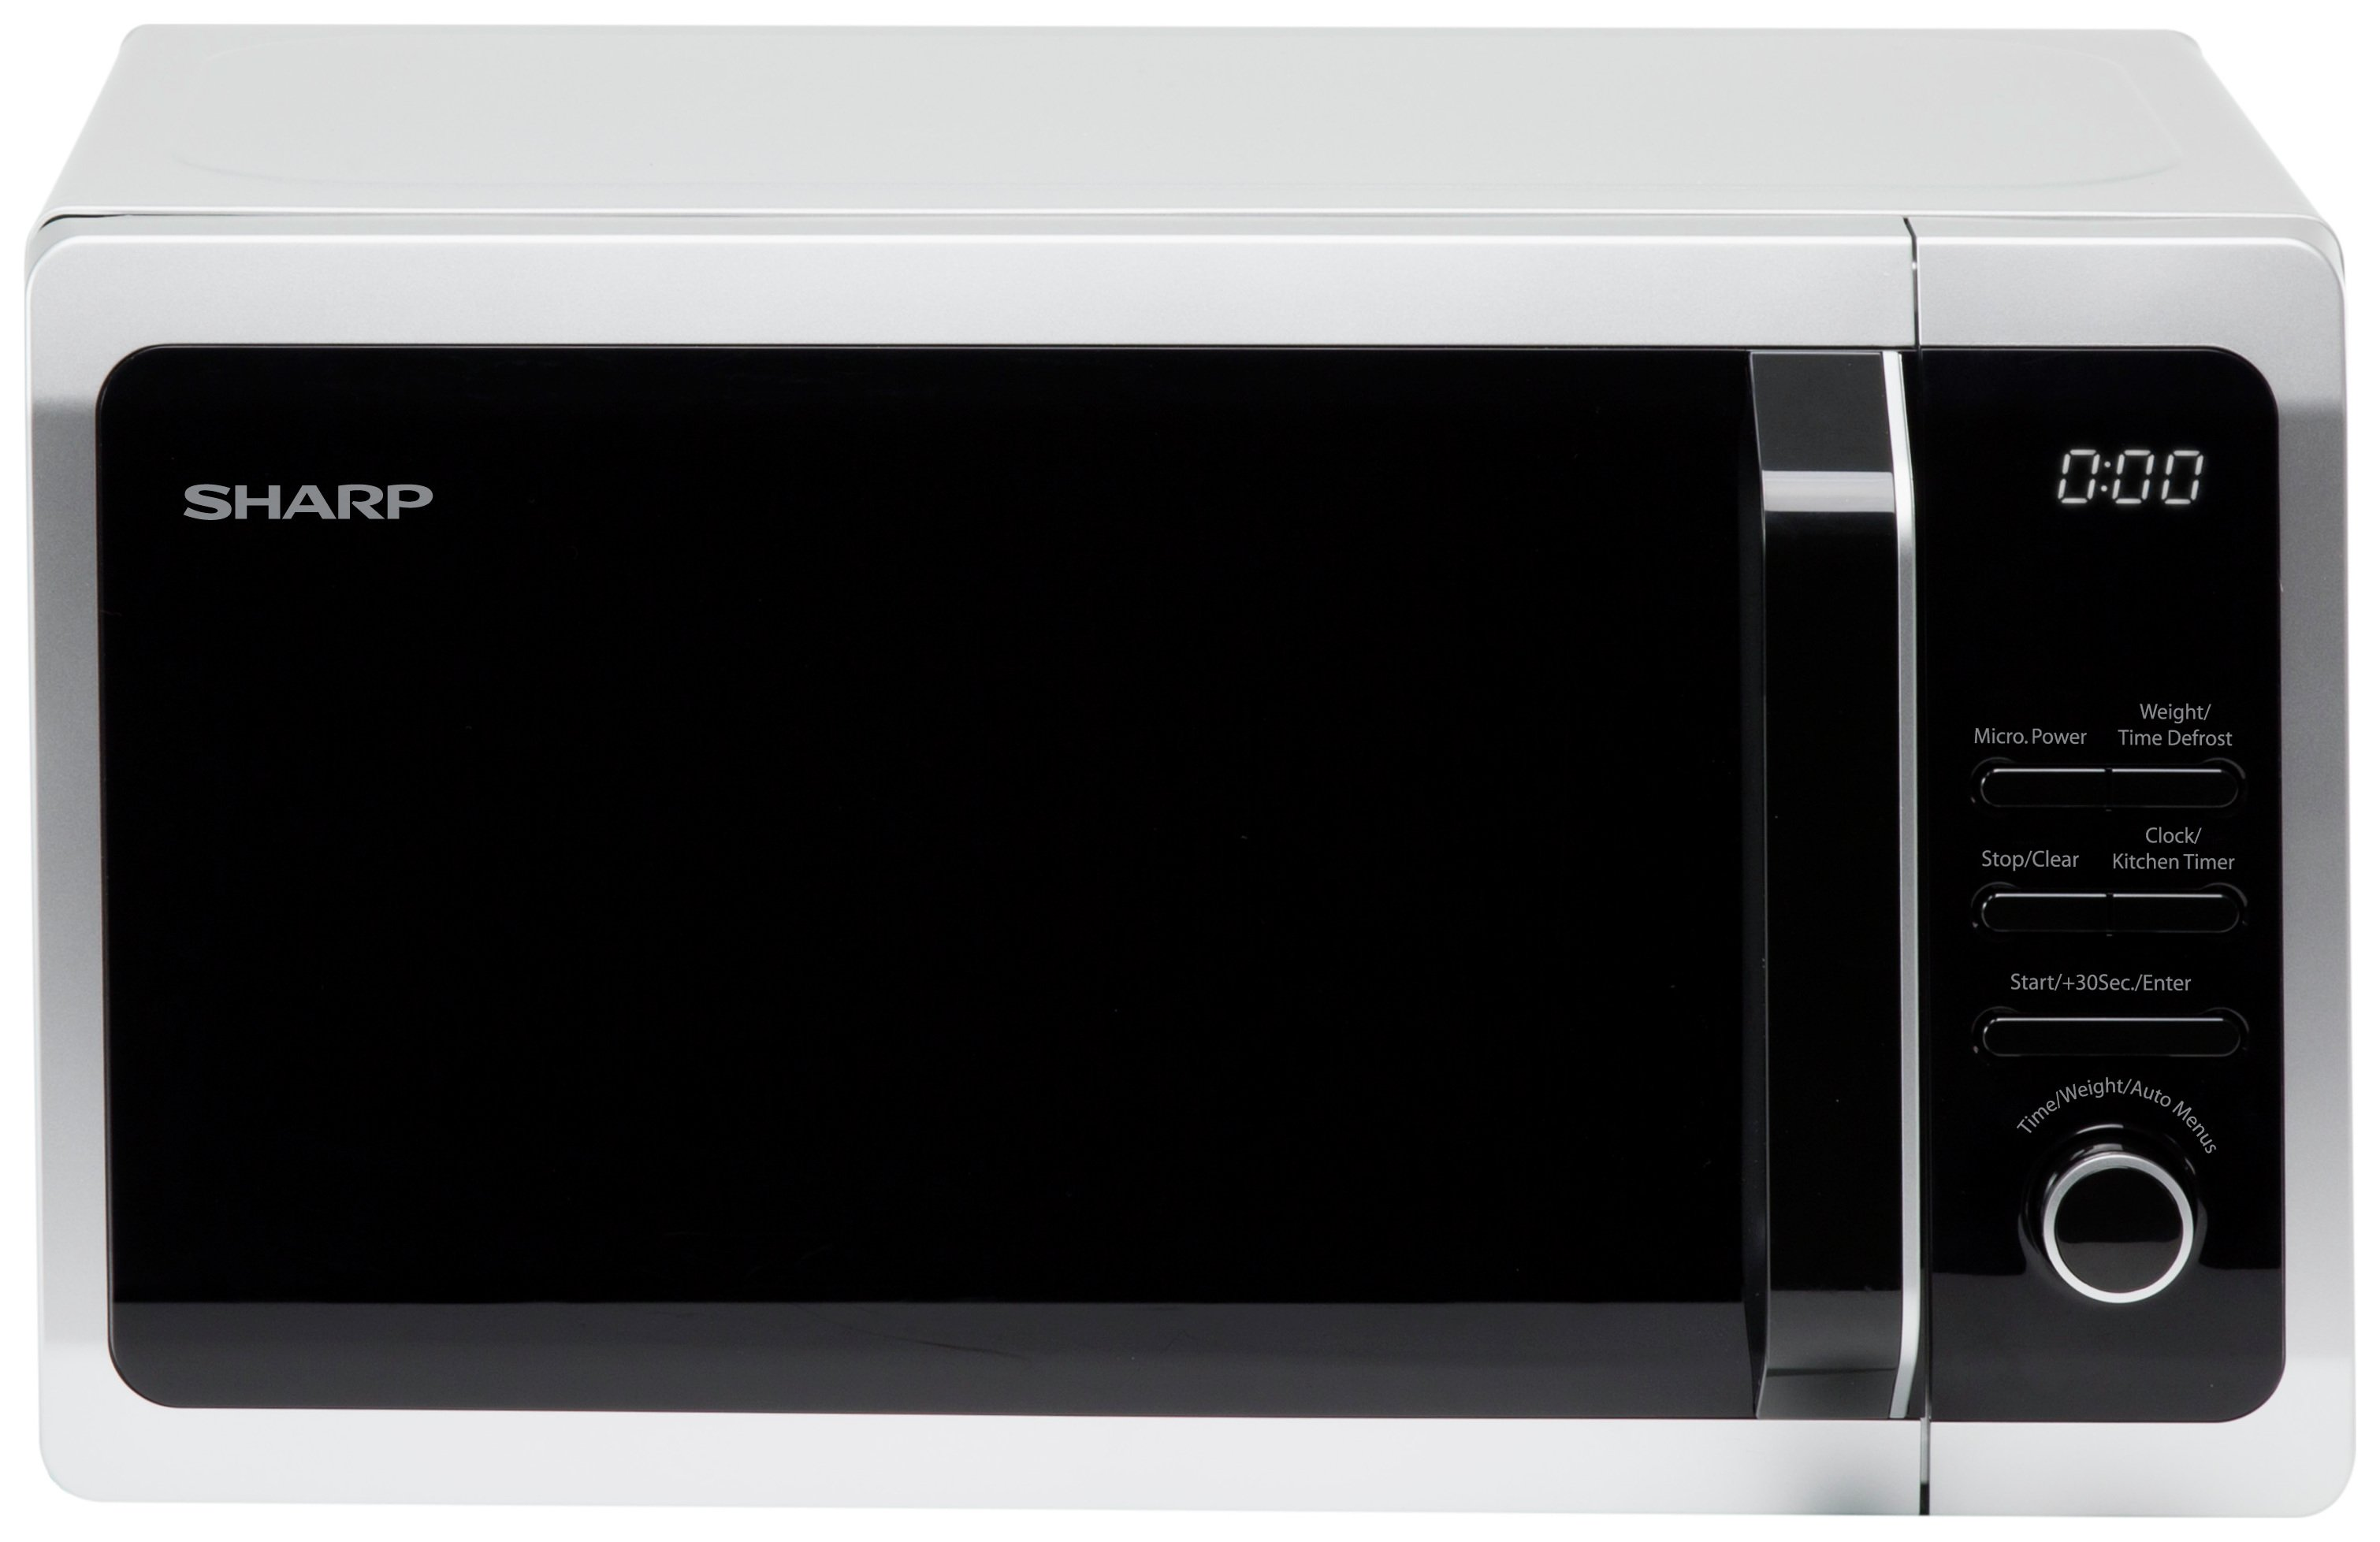 Sharp - Microwave - R274SLM 20L 800W - Silver